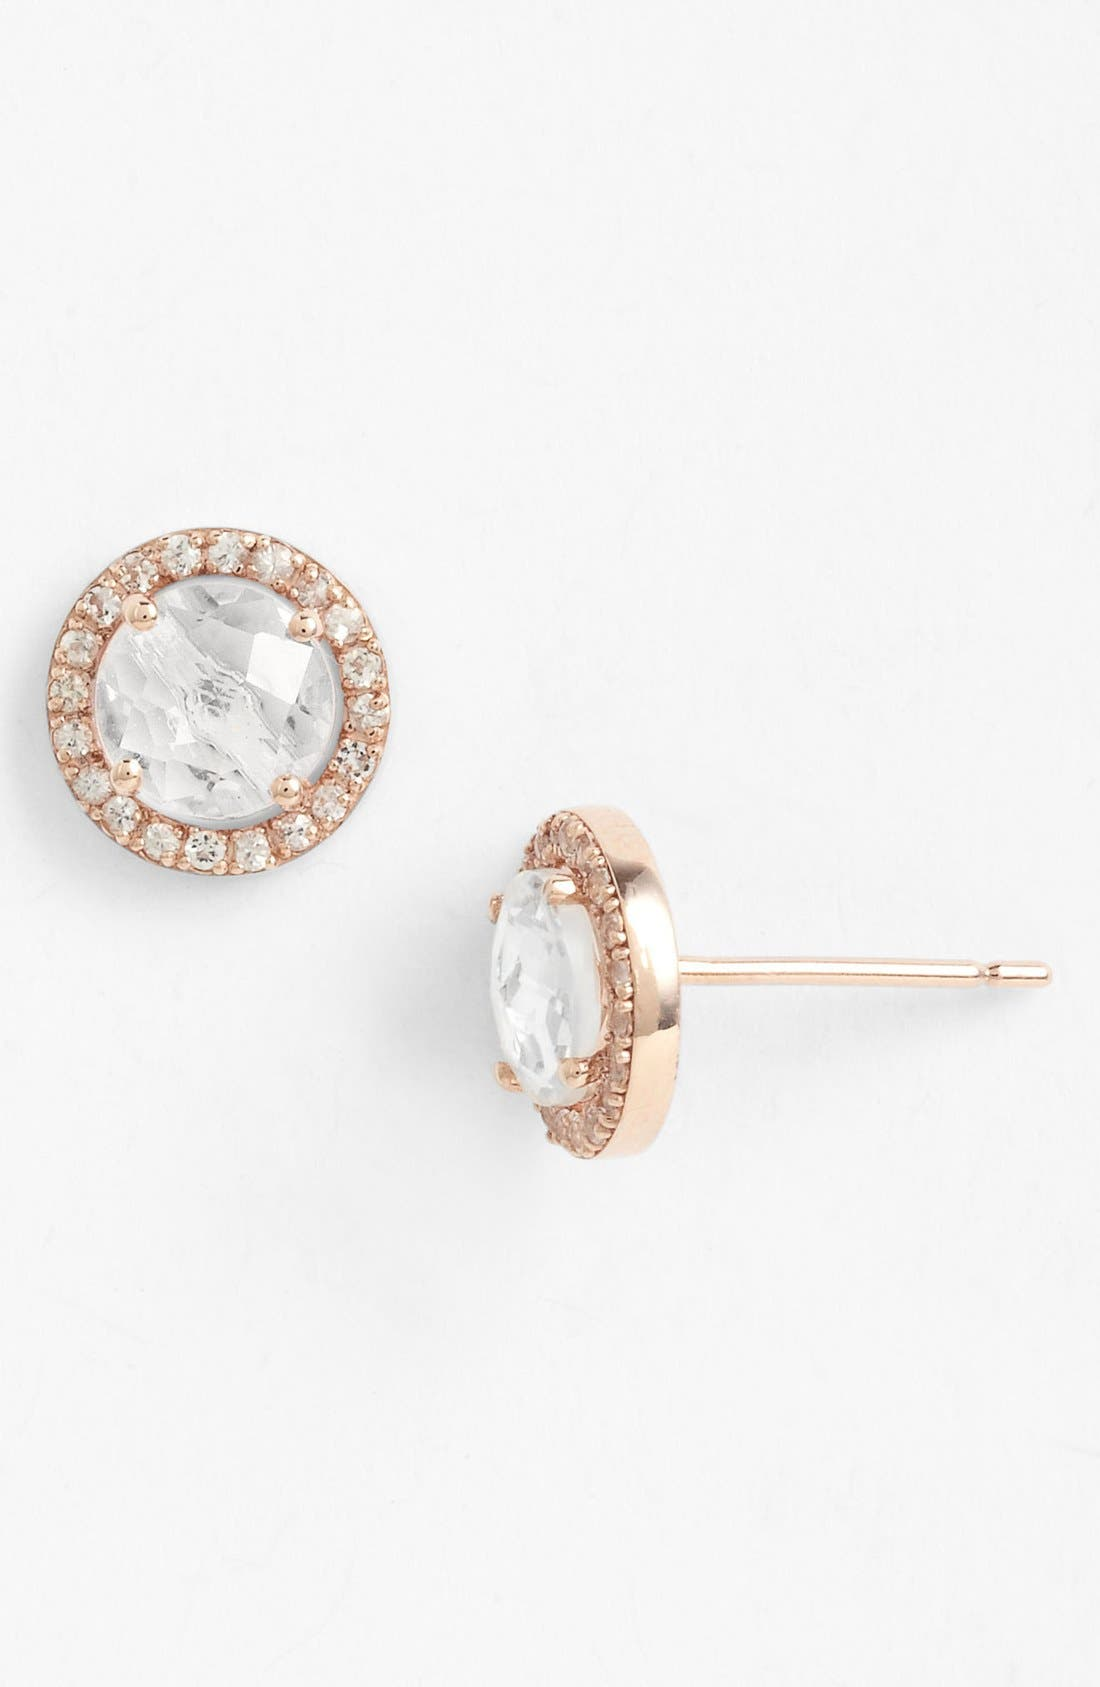 Alternate Image 1 Selected - KALAN by Suzanne Kalan Round Sapphire Bezel Earrings